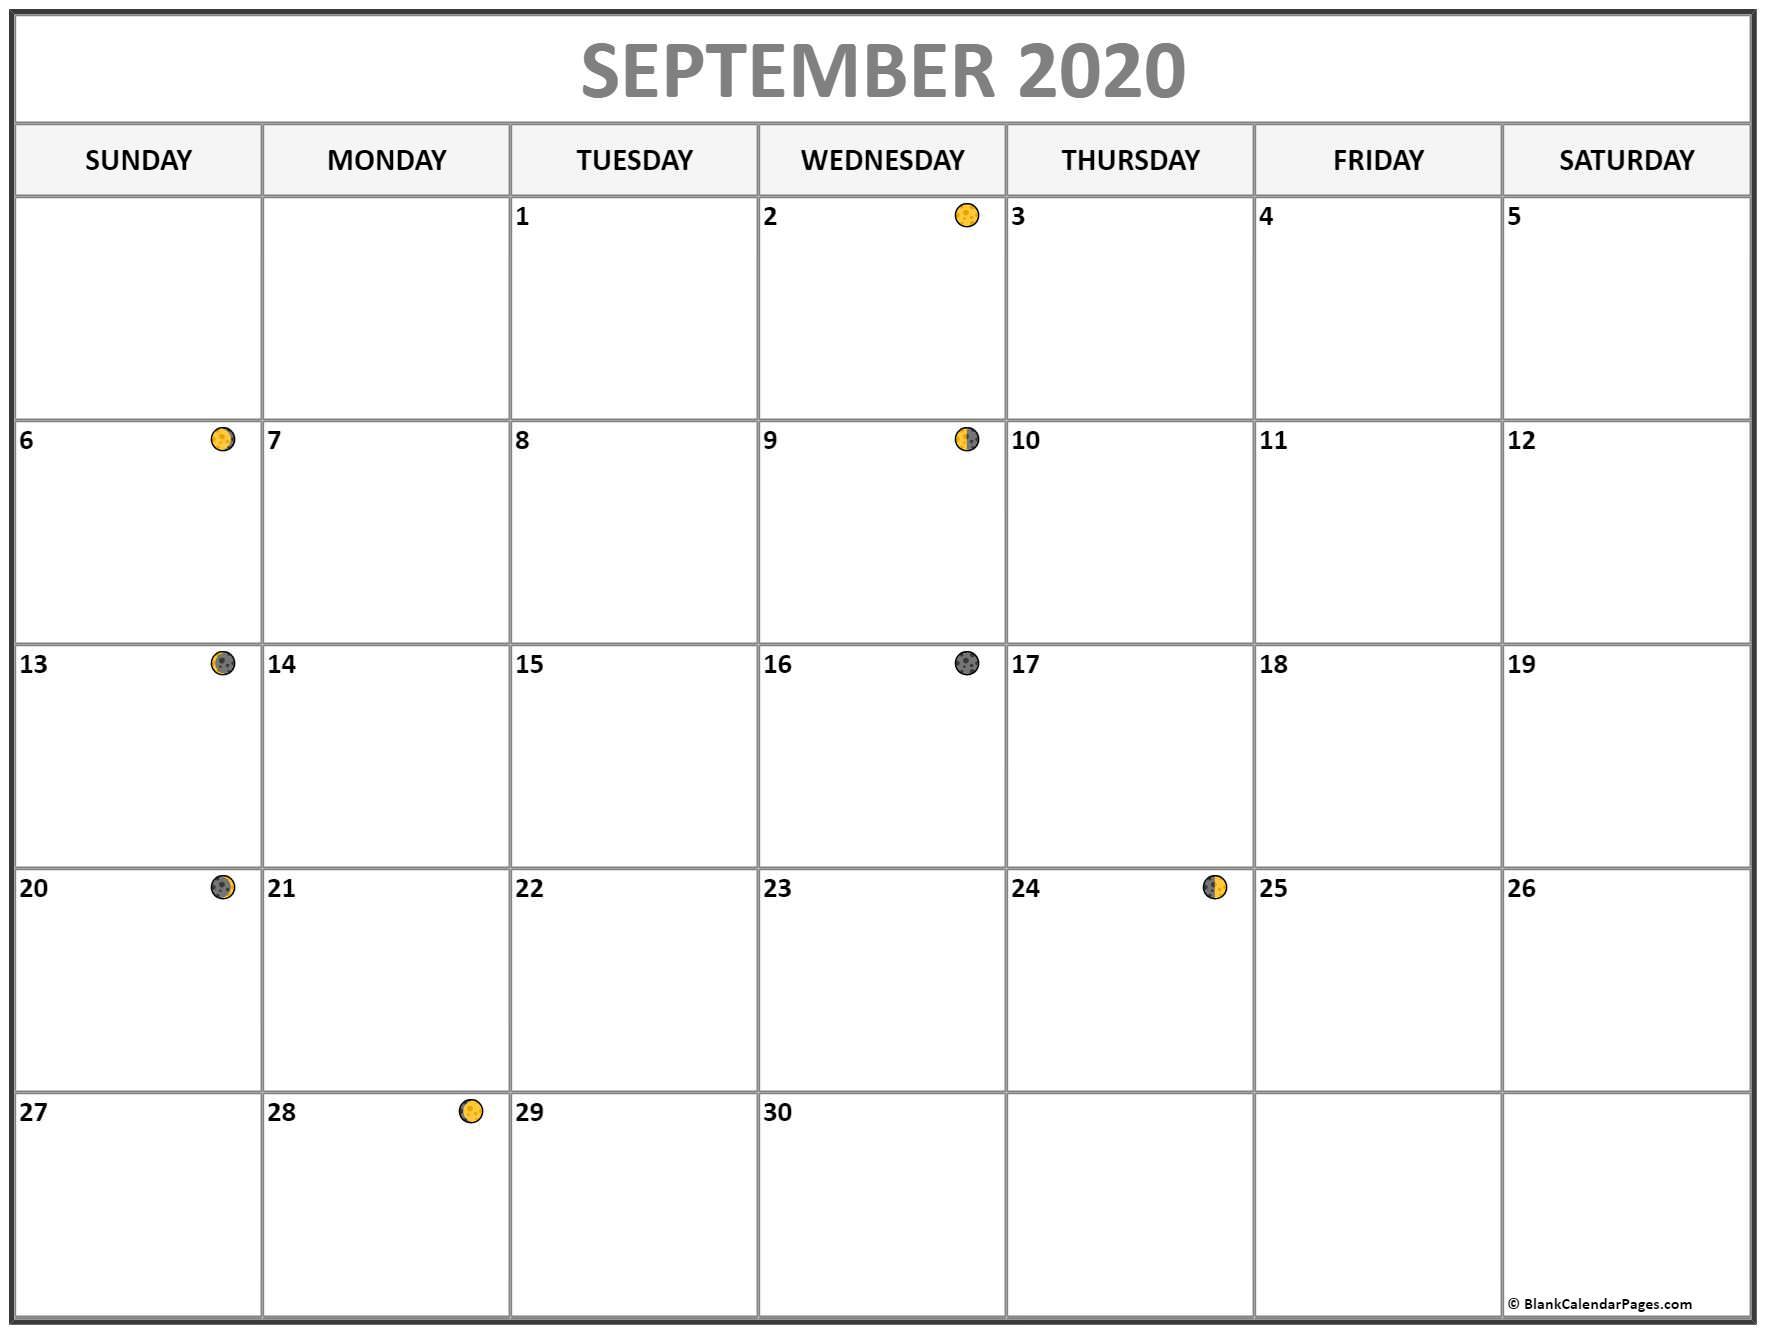 September 2020 Lunar Calendar | Moon Phase Calendar